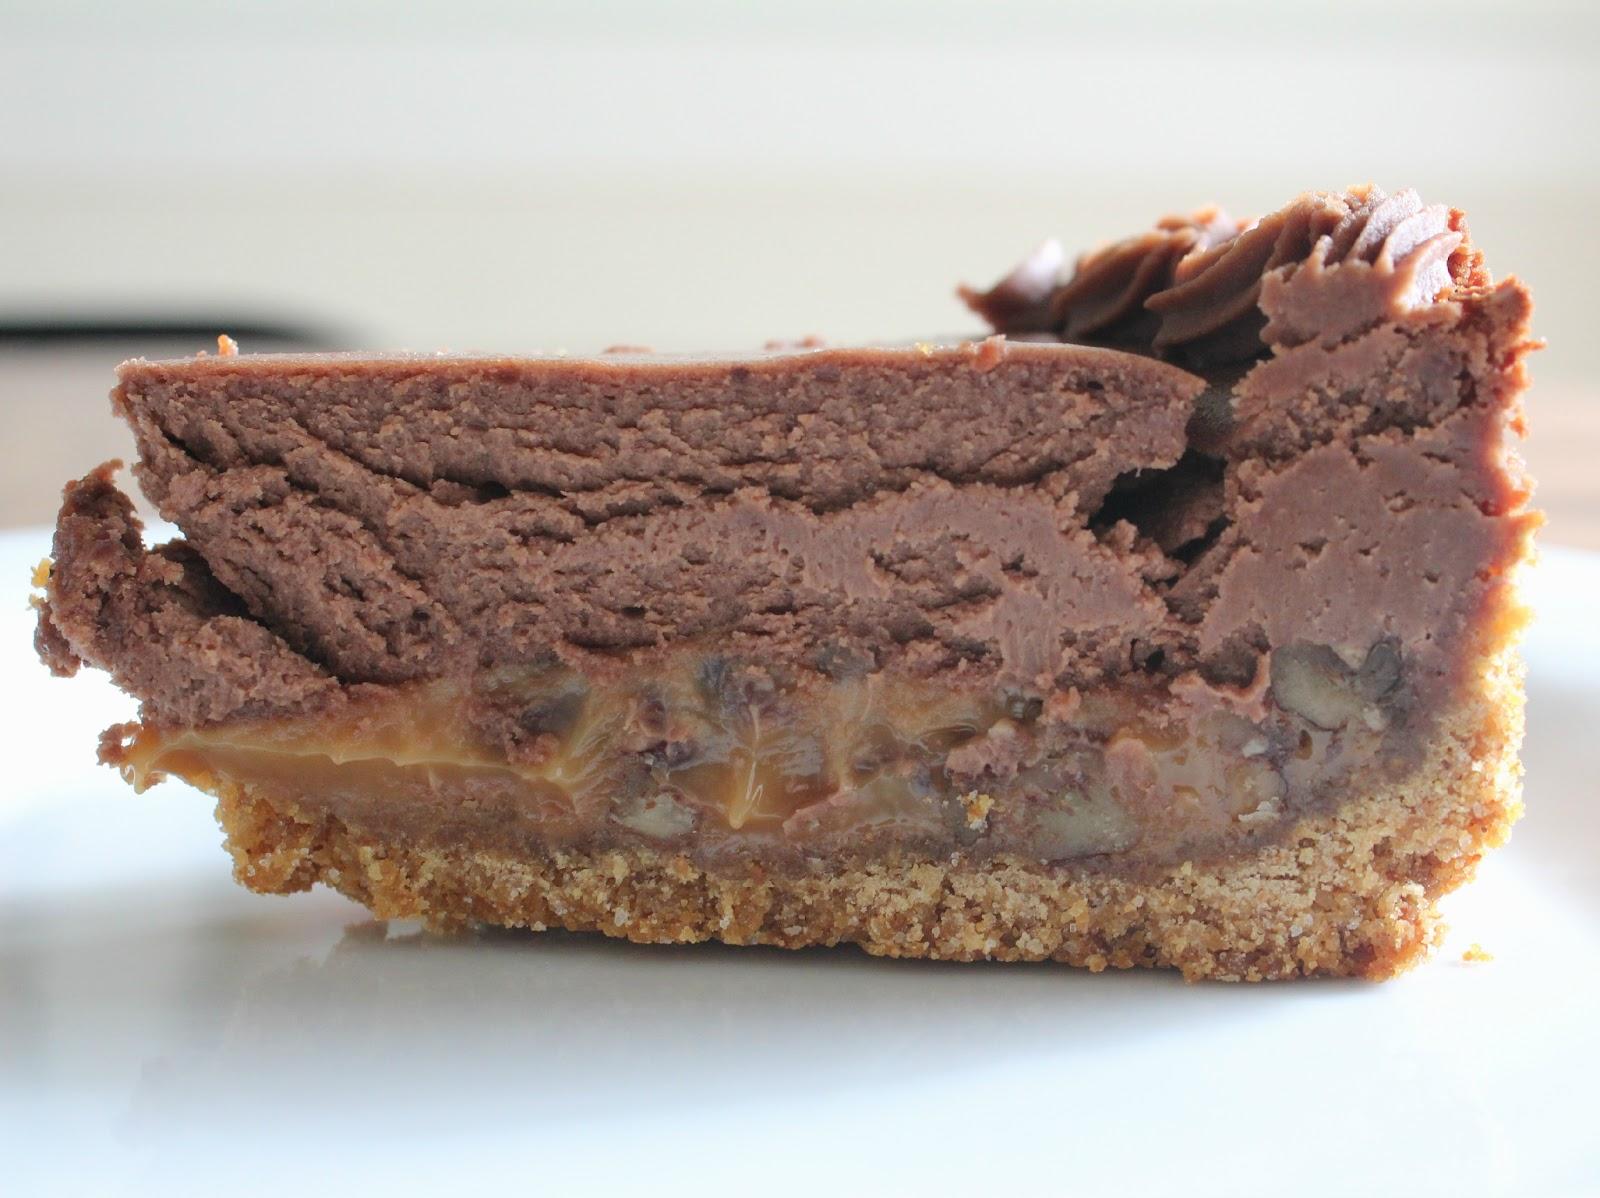 Savor His Goodness: Chocolate Turtle Cheesecake